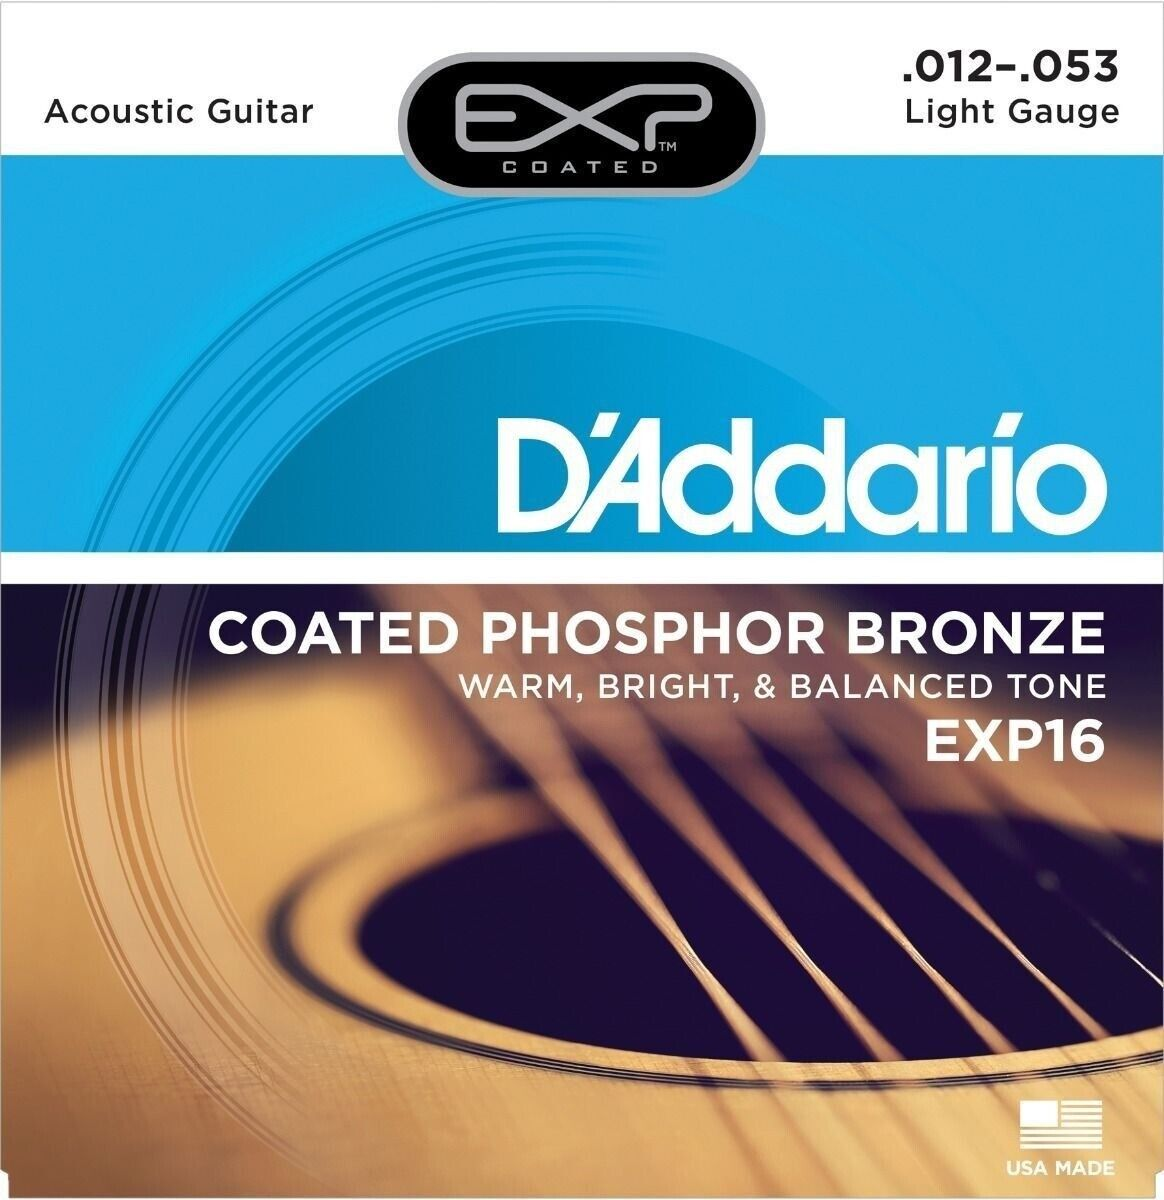 10 Sets D'Addario EXP16 Beste Posphor Bronze Gitarrensaiten Licht 12-53